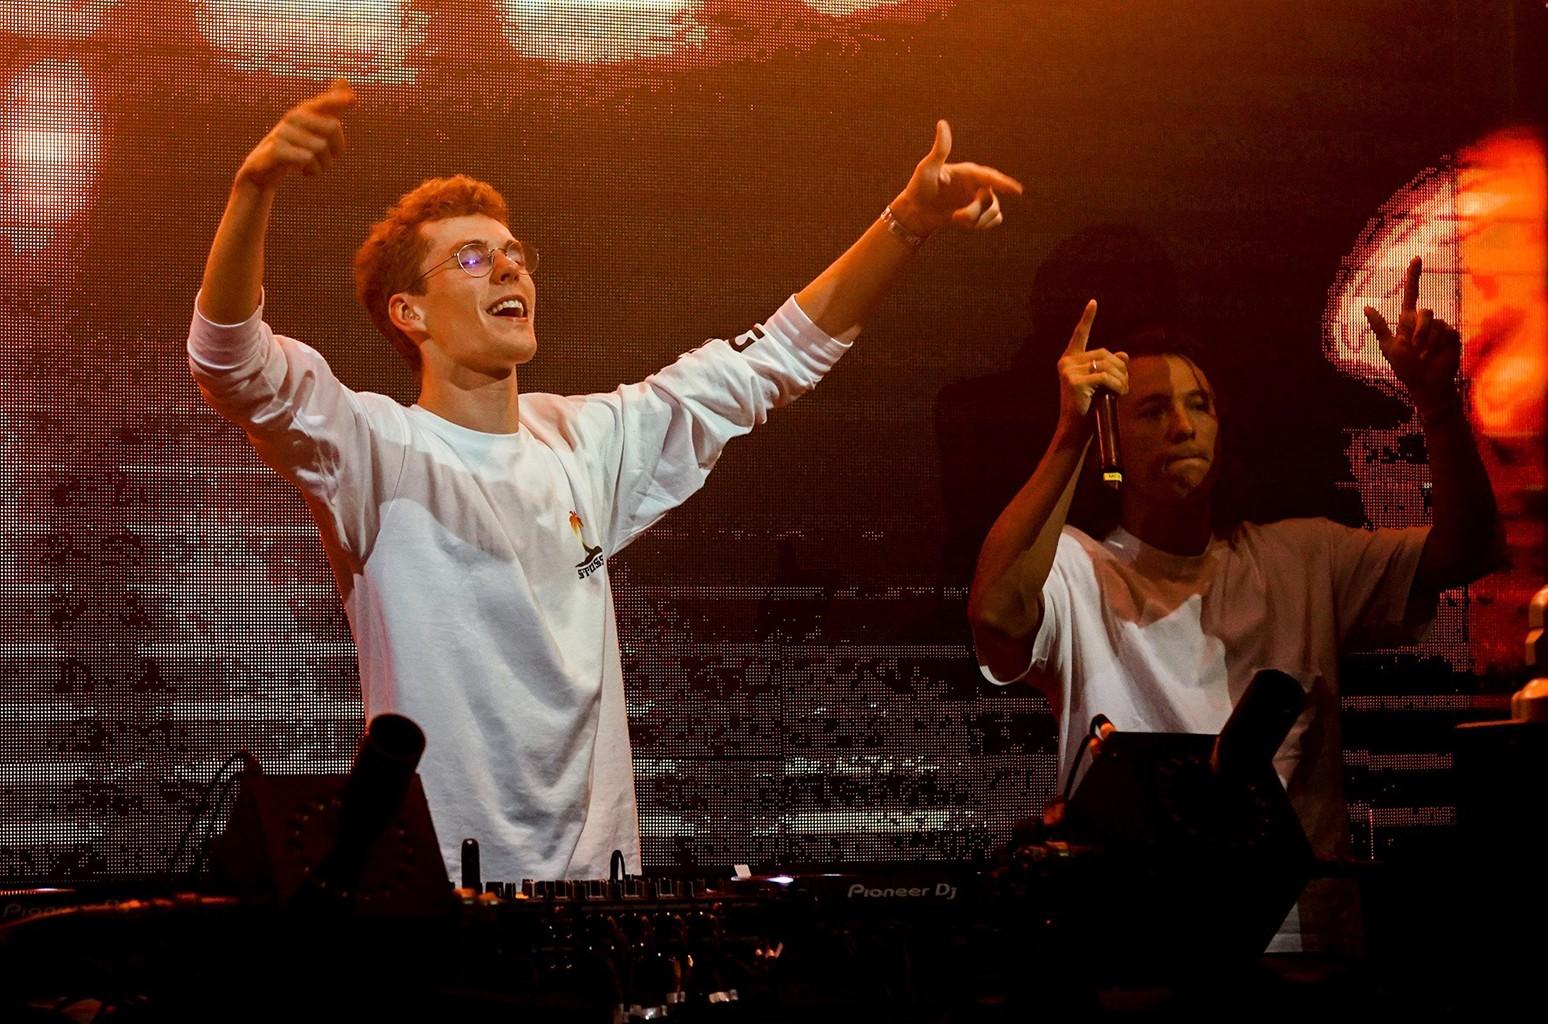 DJ Lost Frequencies